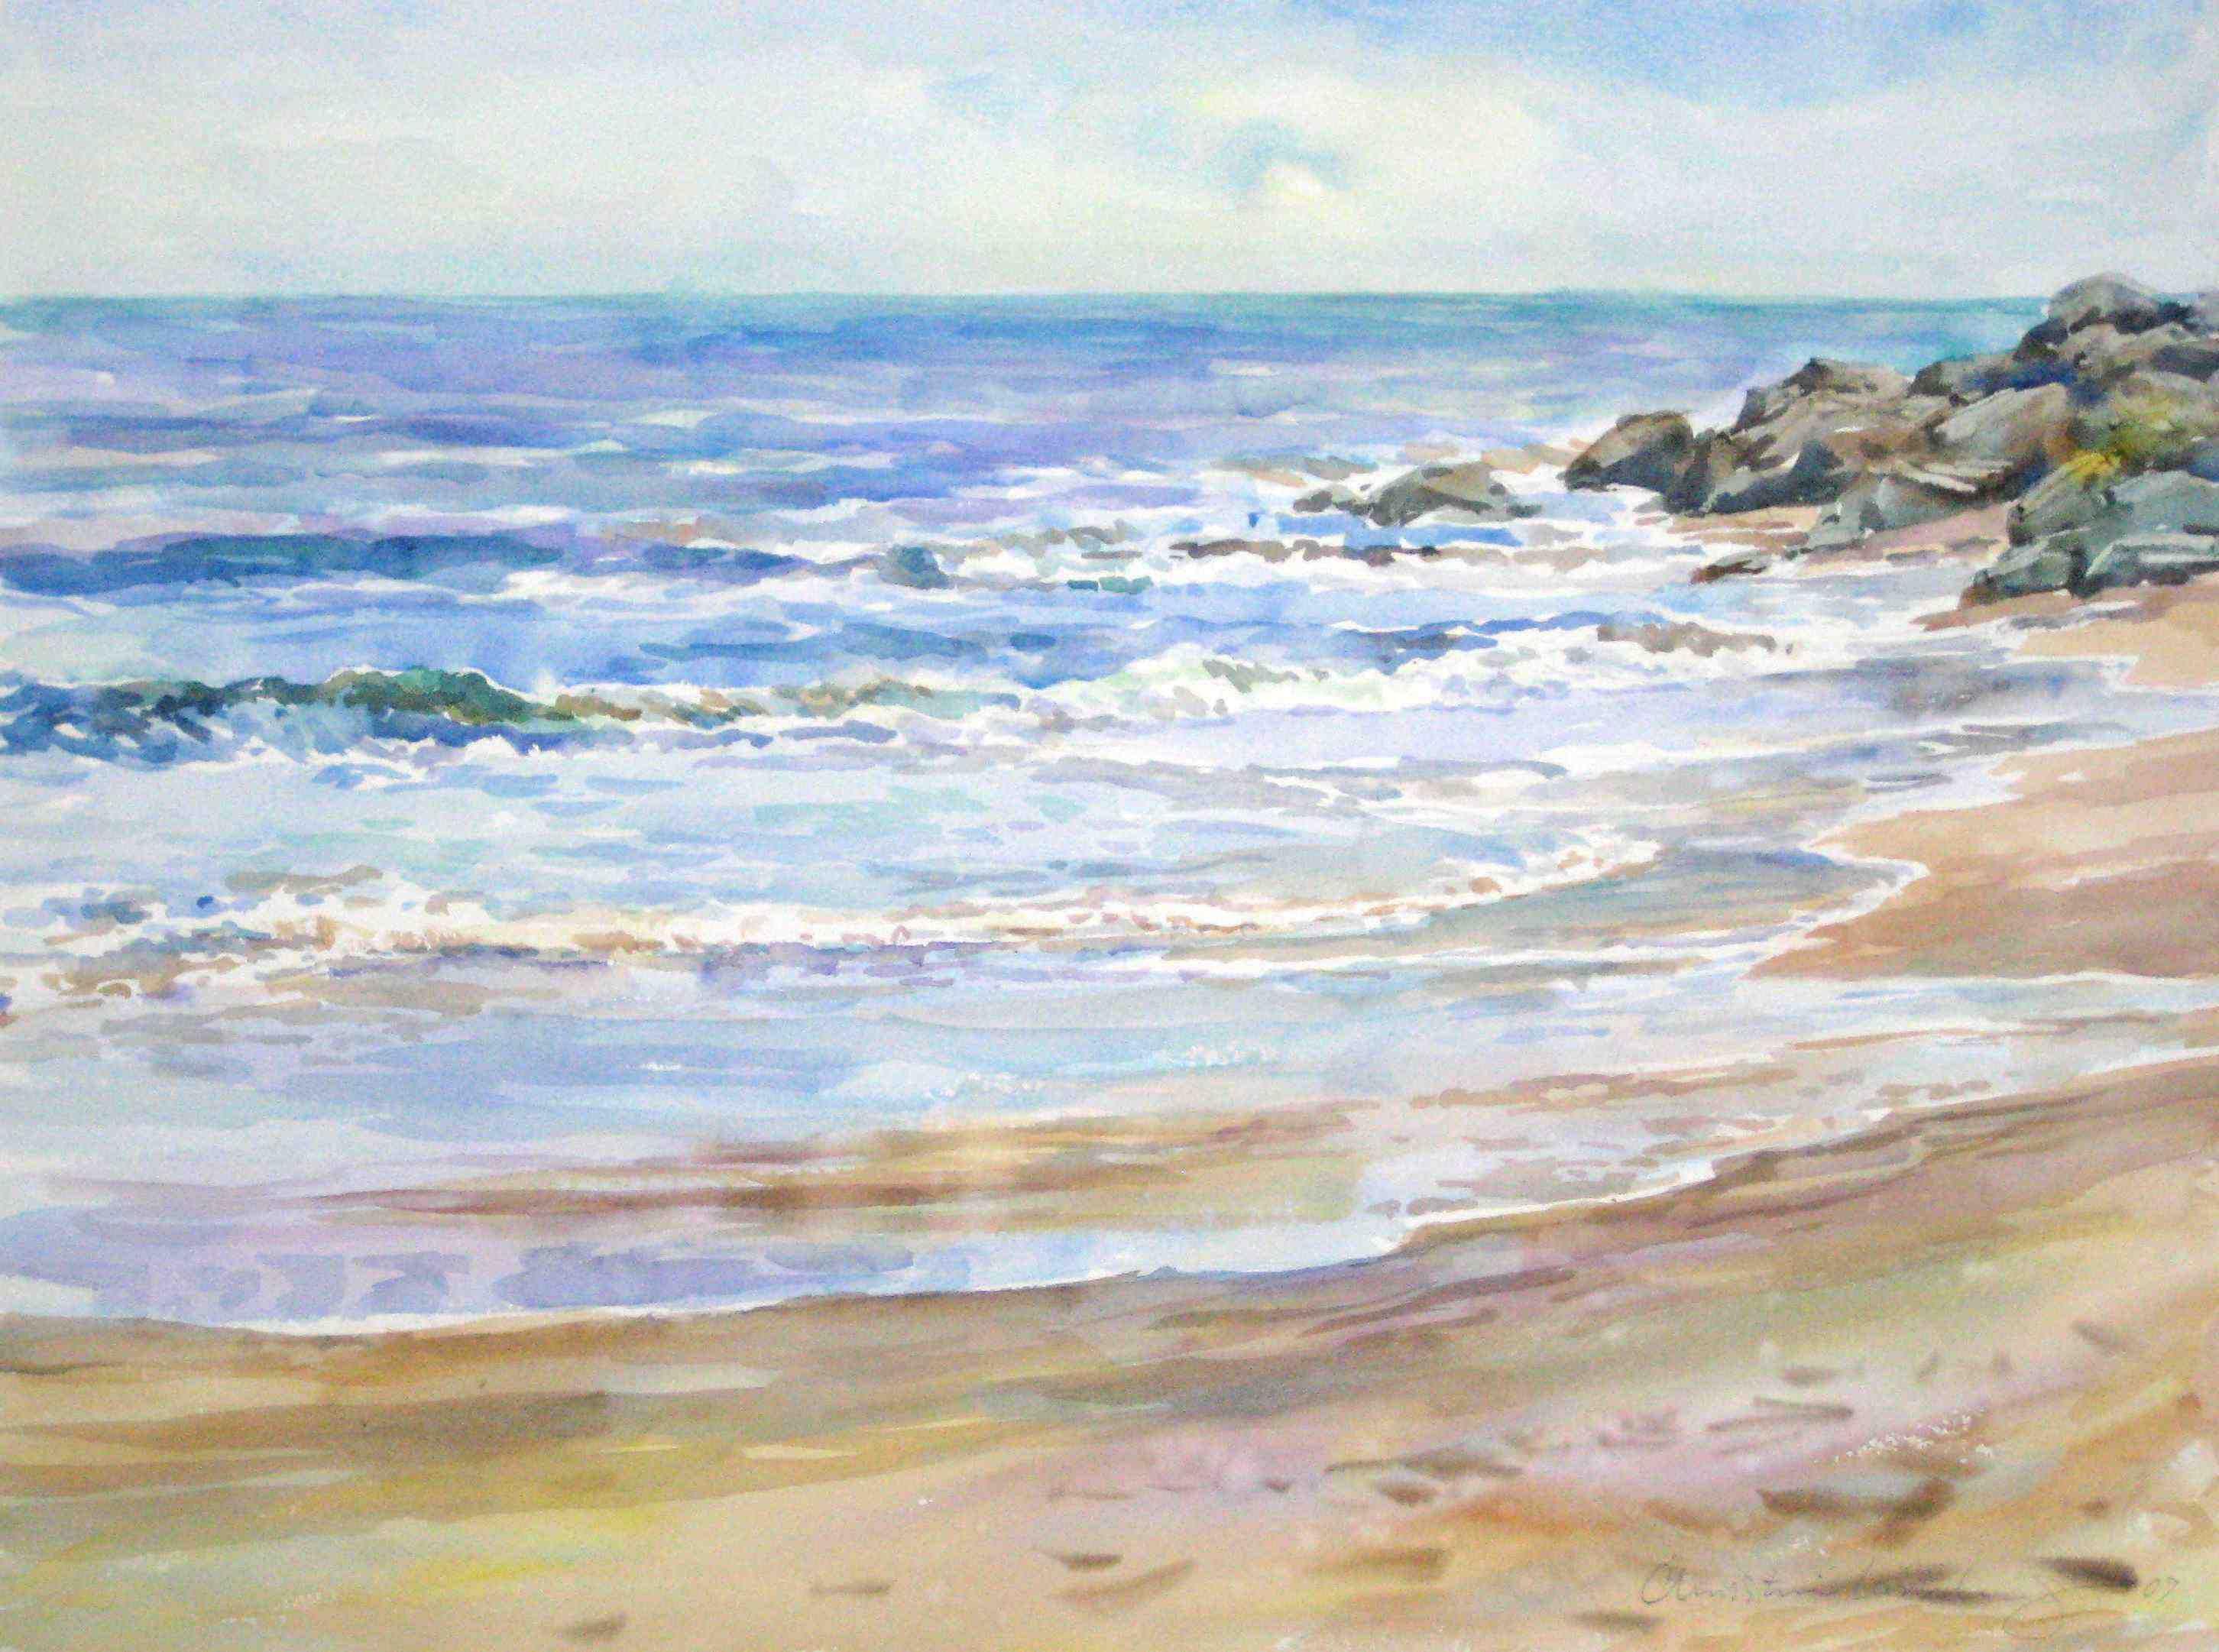 Watercolor artist magazine palm coast fl - Watercolor Beach Scene Http Lashleystudio Tripod Com Sitebuildercontent Sitebuilderpictures